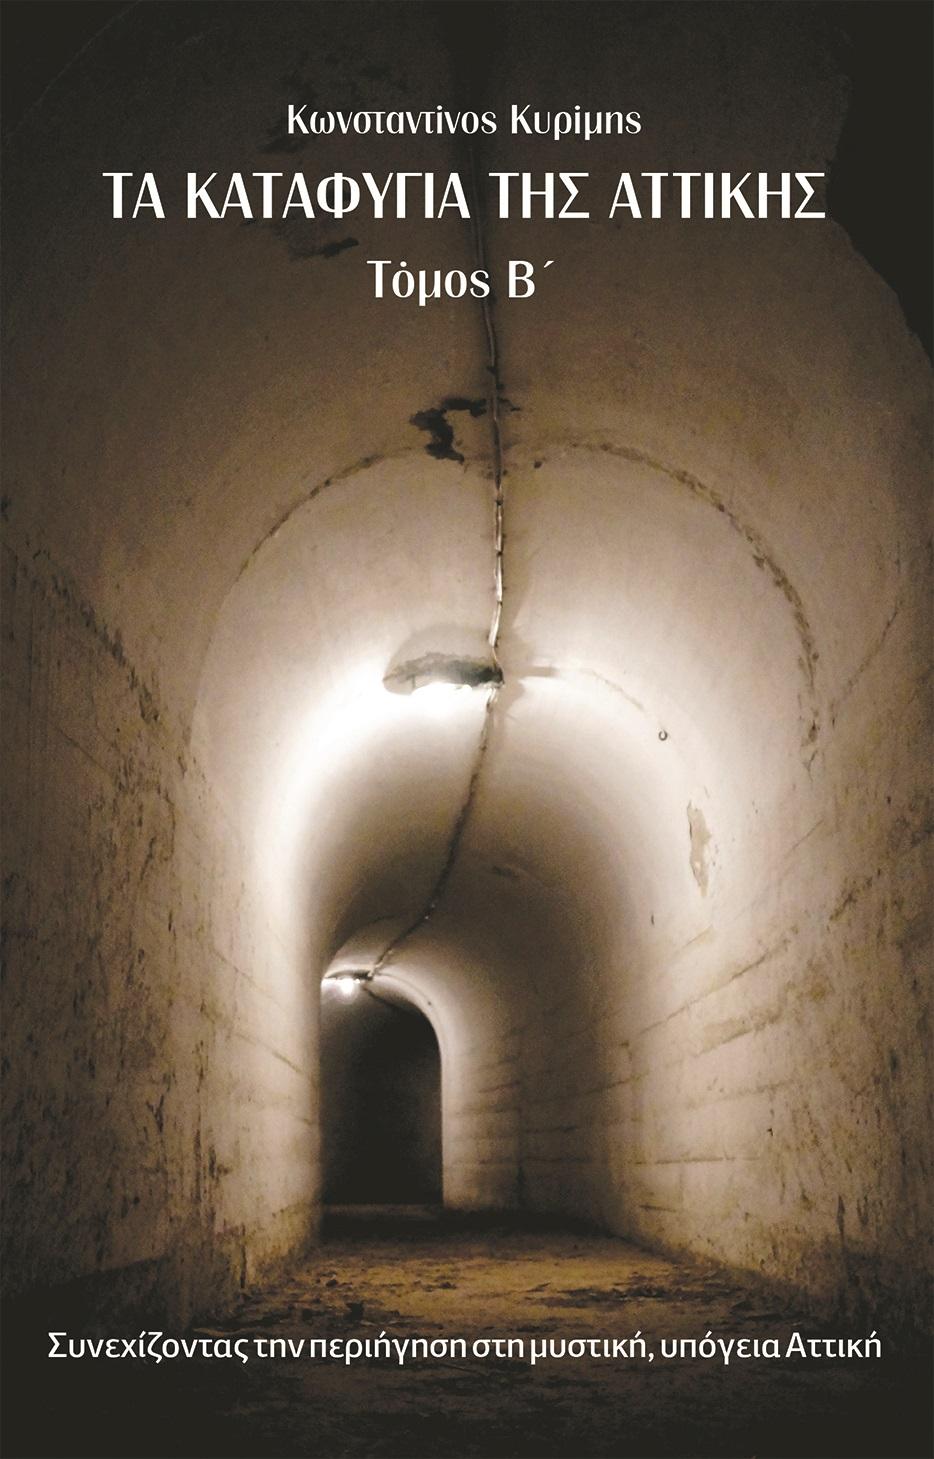 KATAFYGIA_B TOMOS_ COVER